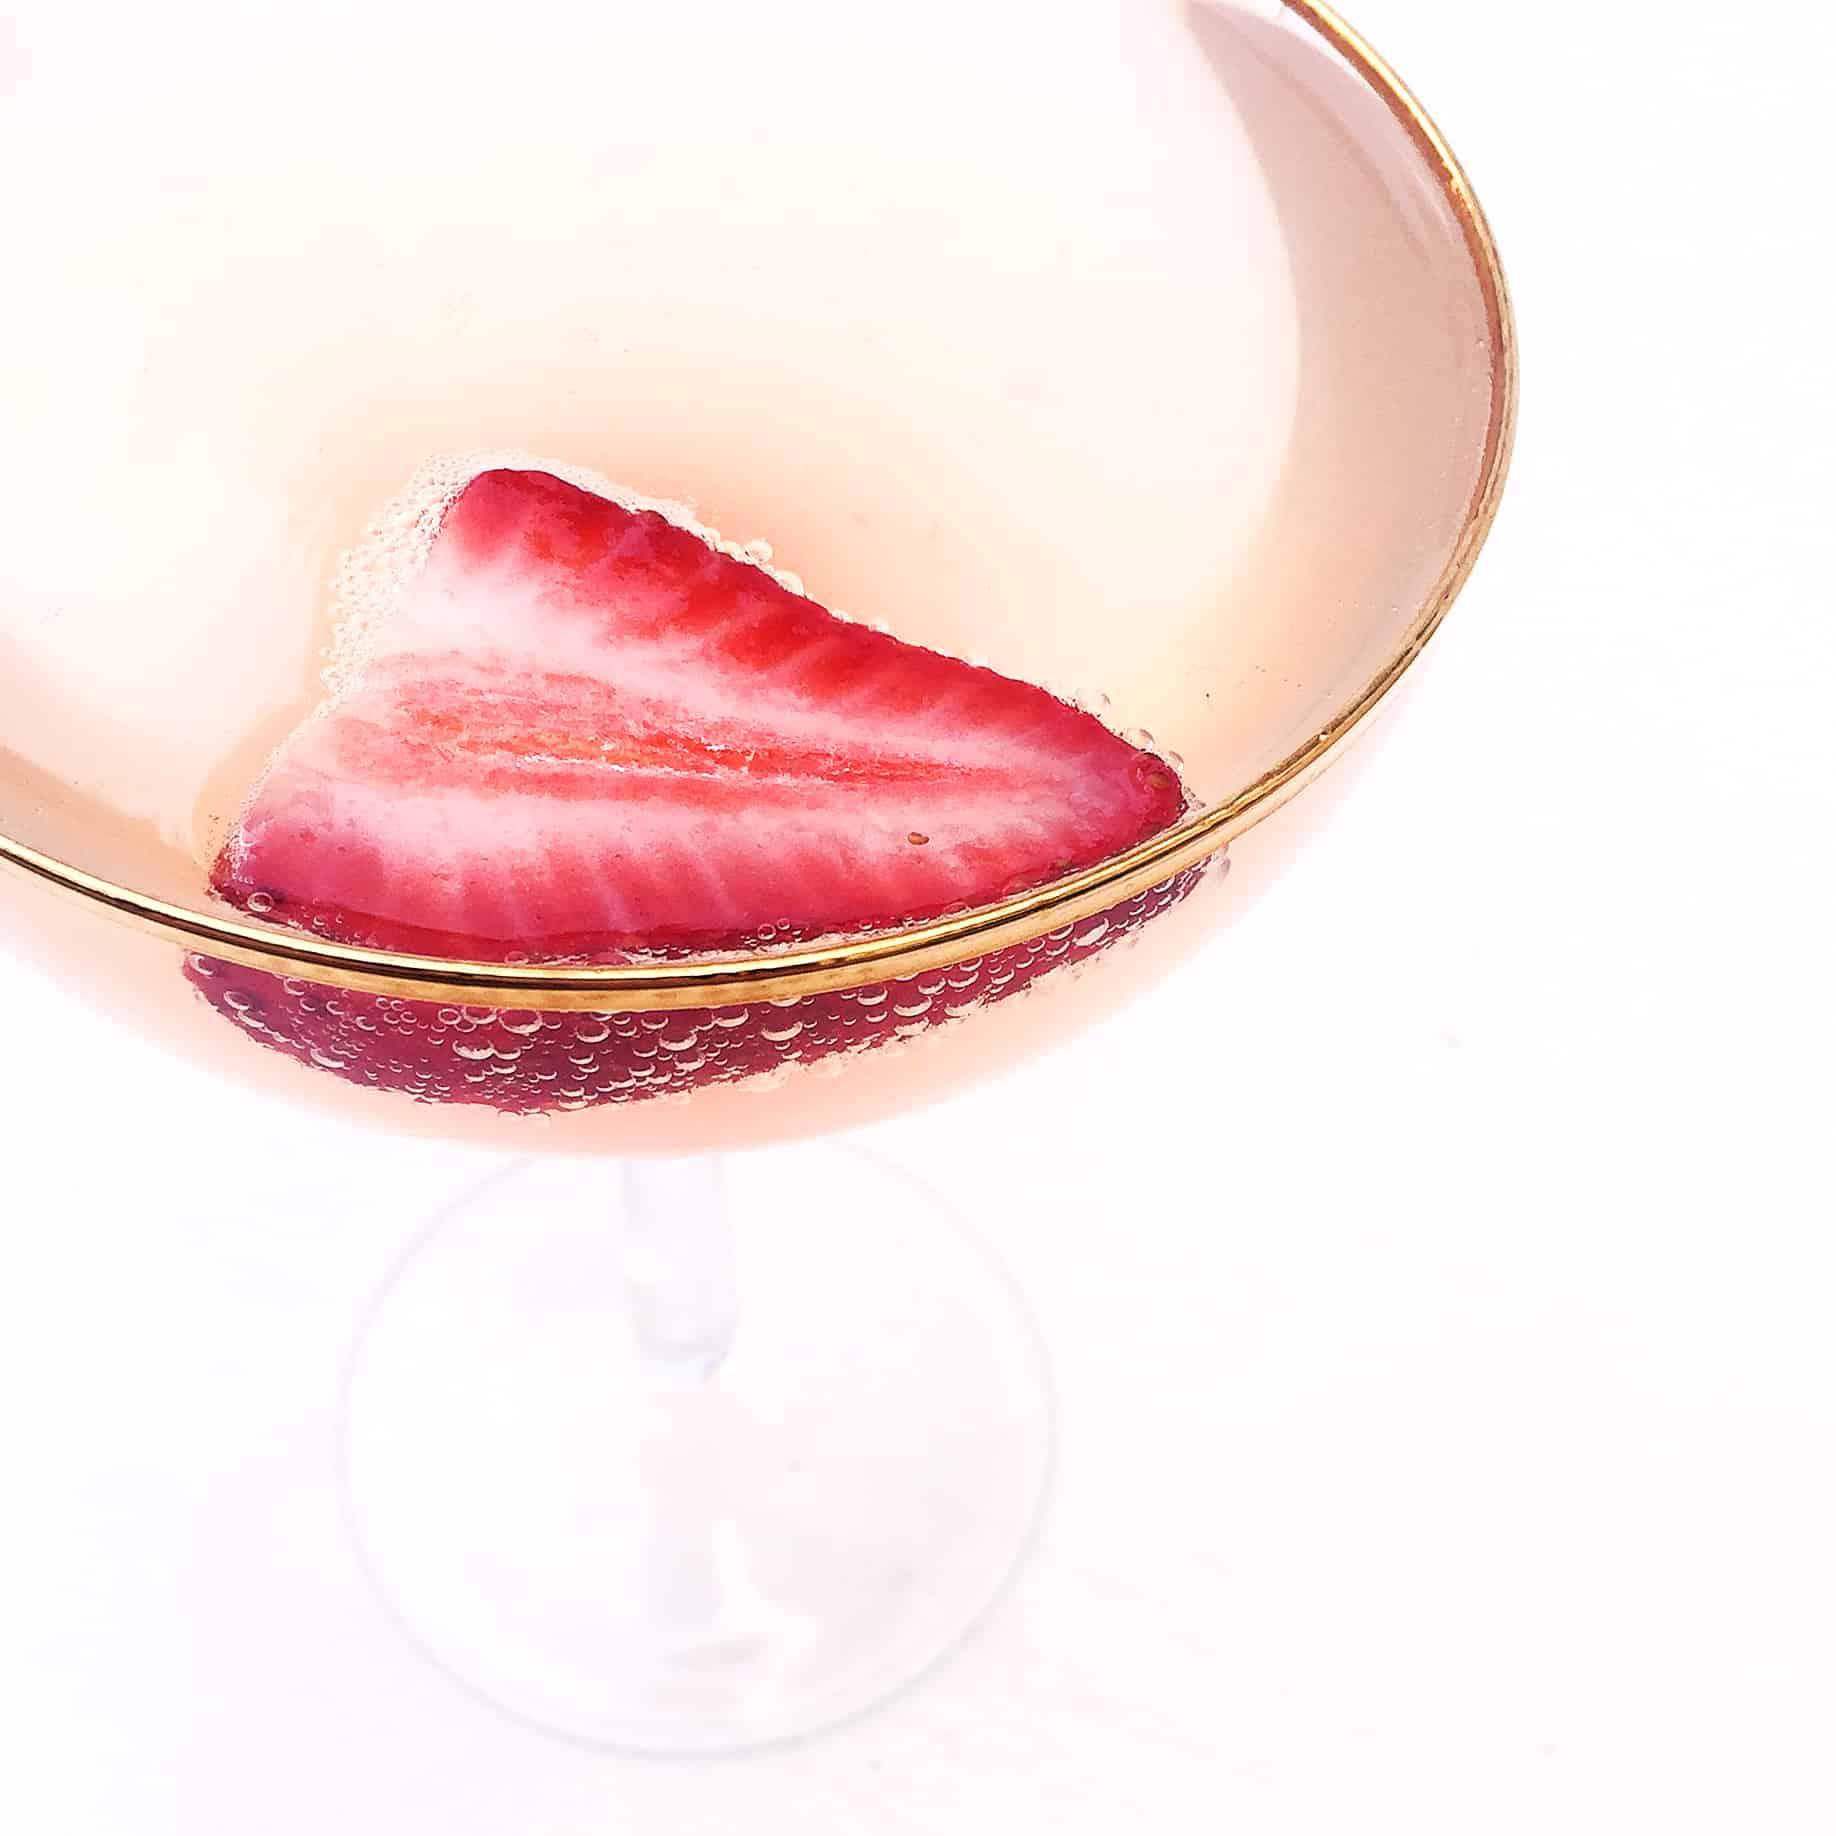 Strawberry Rhubarb Champagne Cocktail Sq